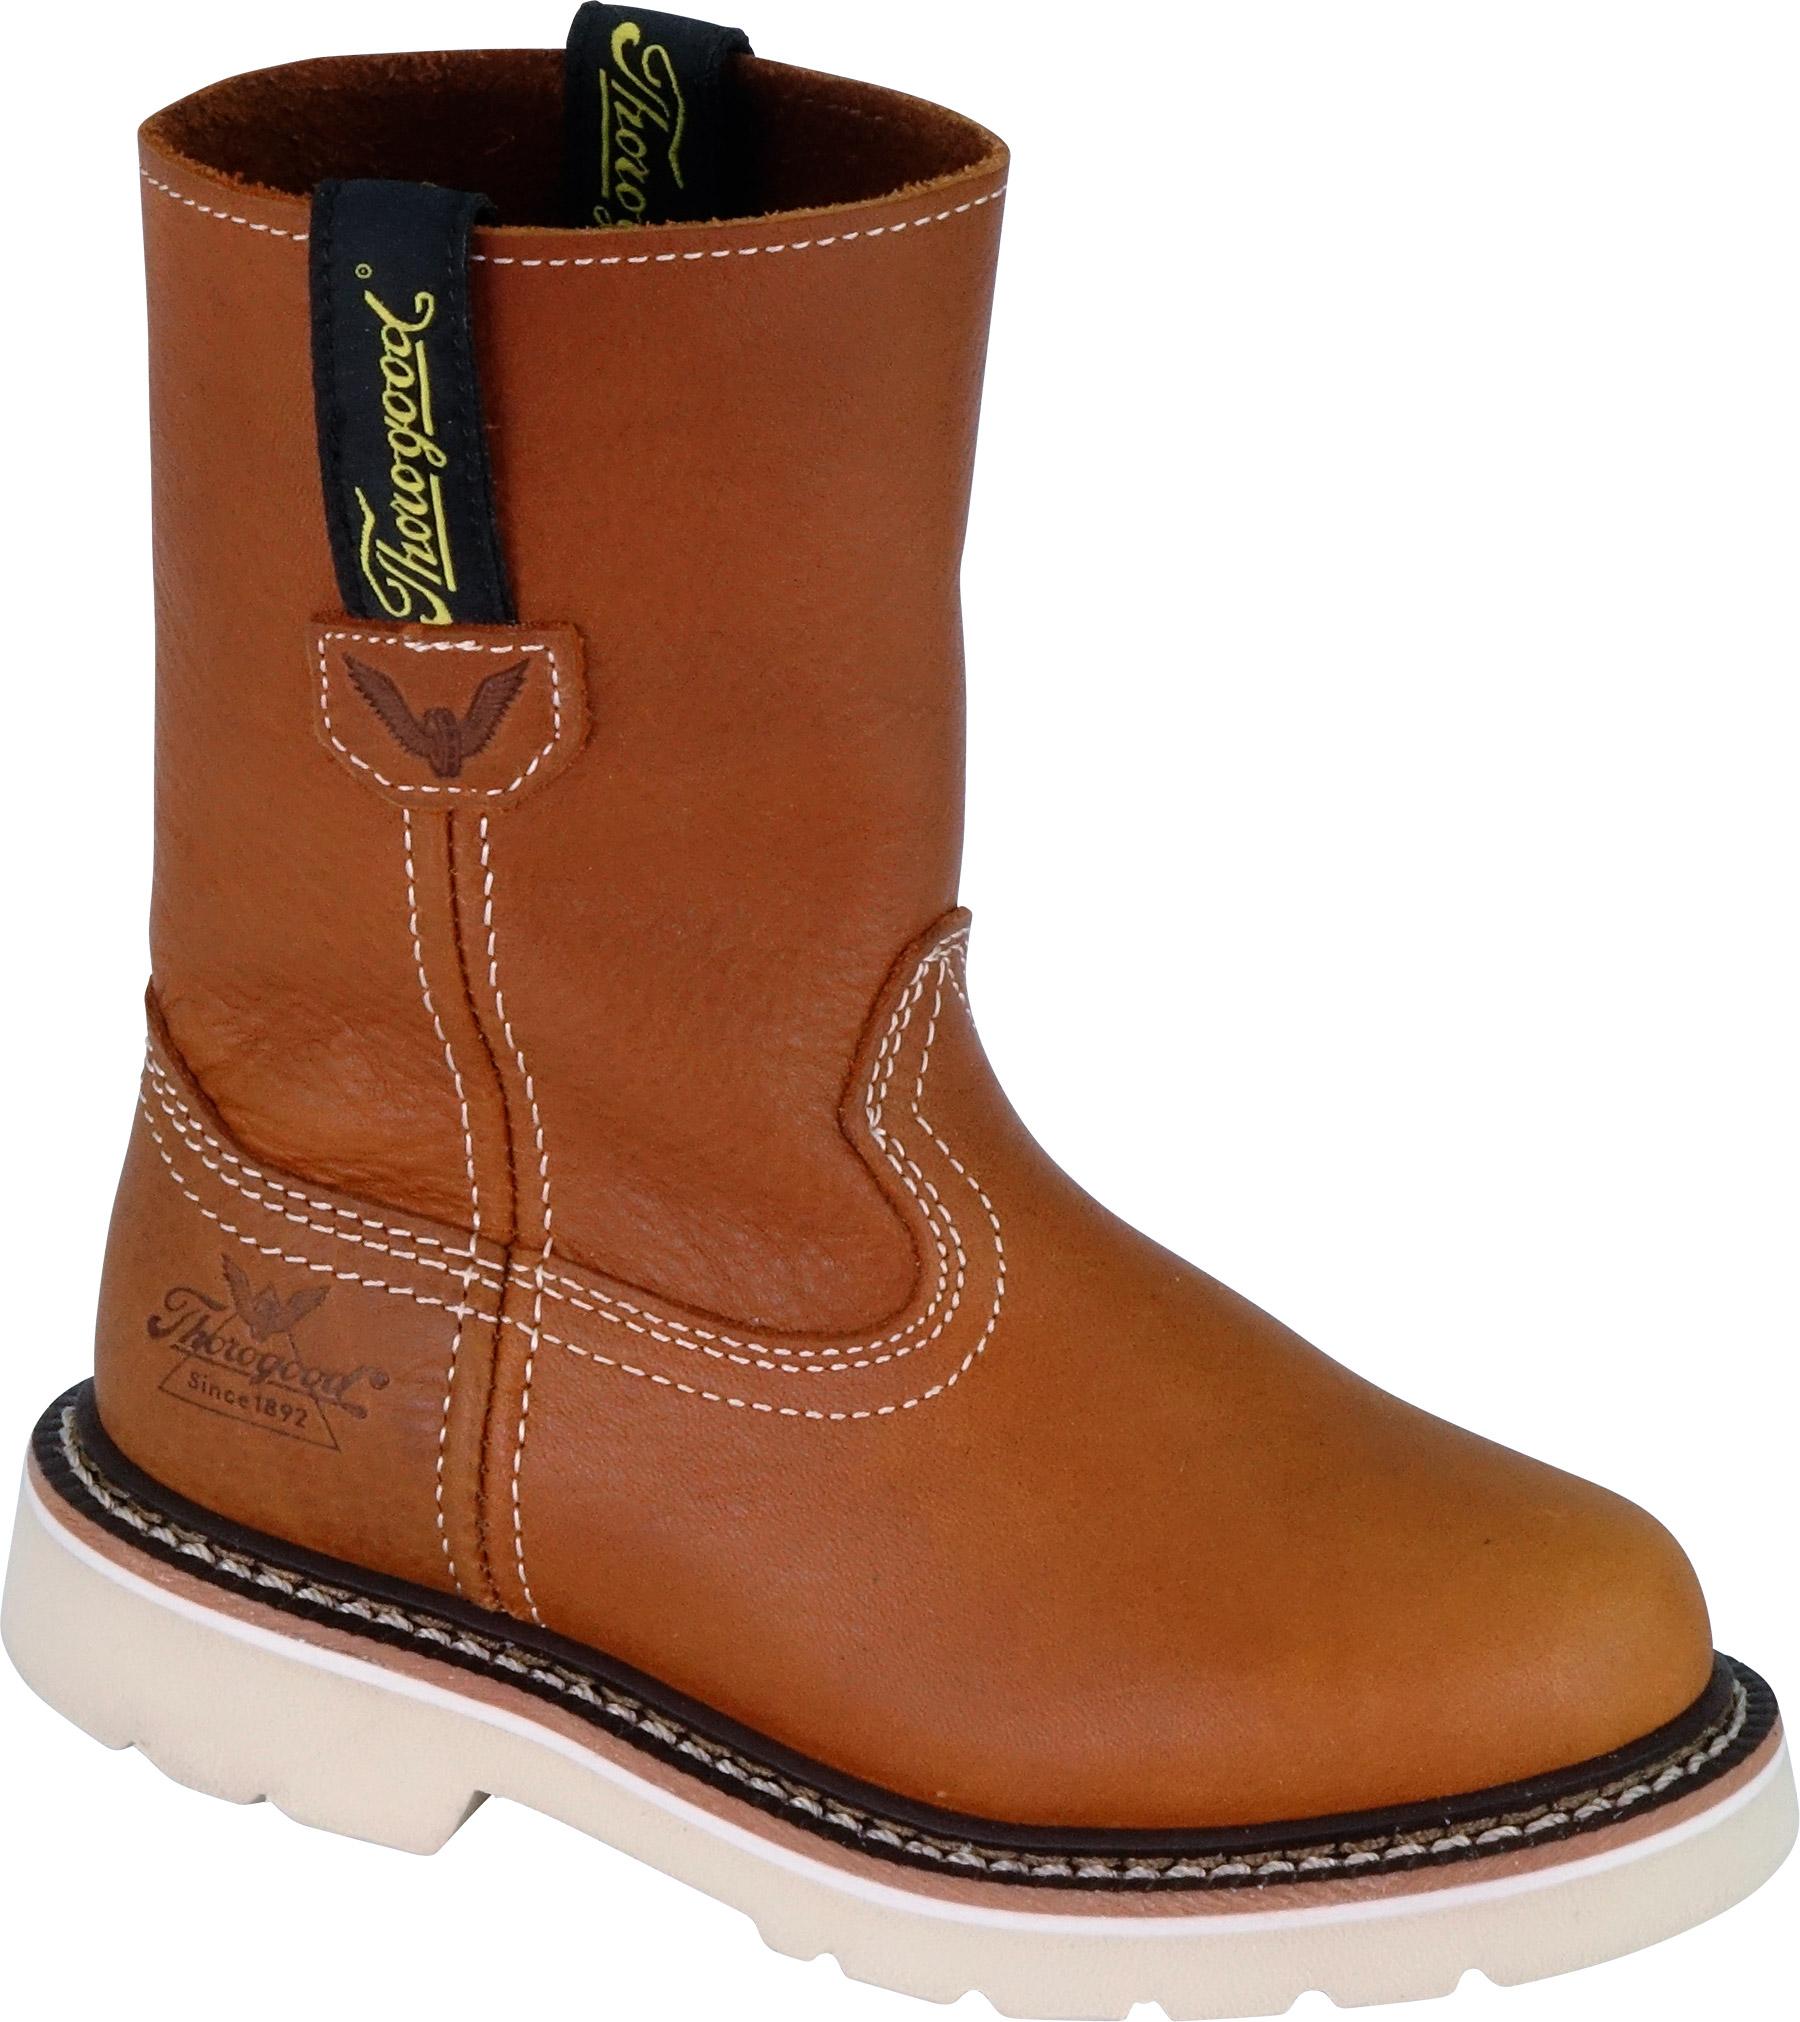 6f904befbd8 Weinbrenner Shoe Company / Thorogood Shoes